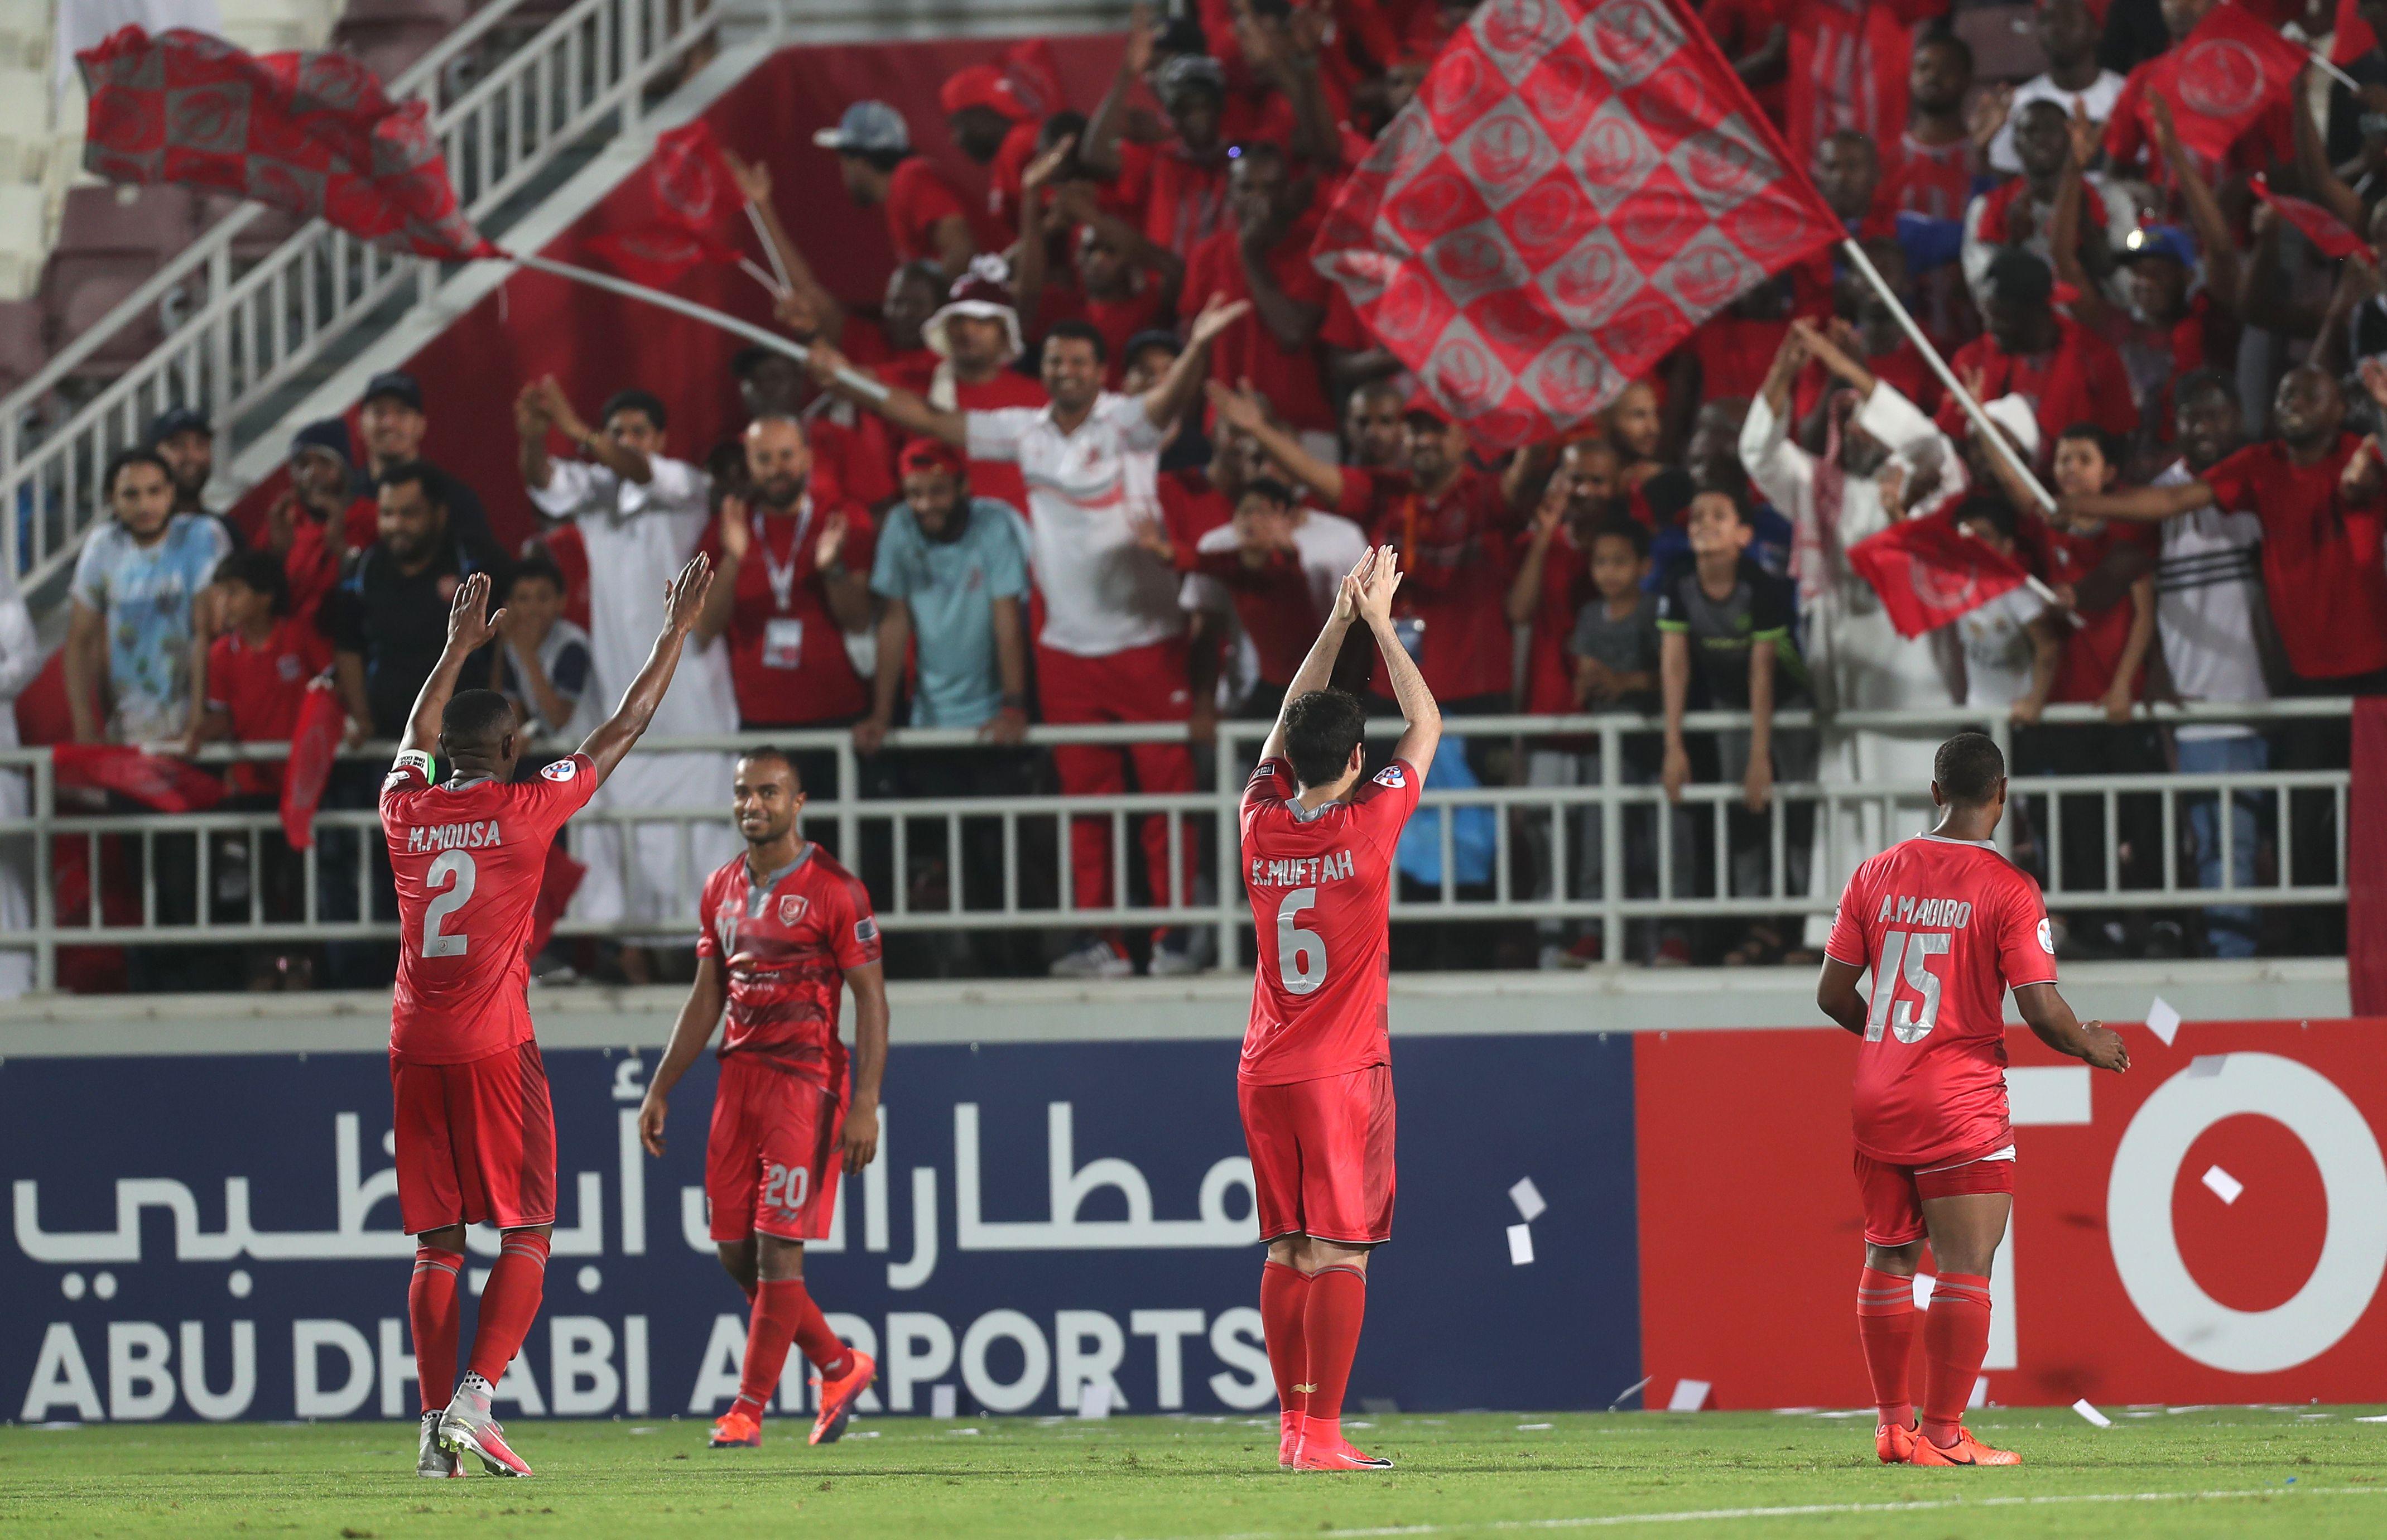 Lekhwiya celebrate after win over Esteghlal Khouzestan